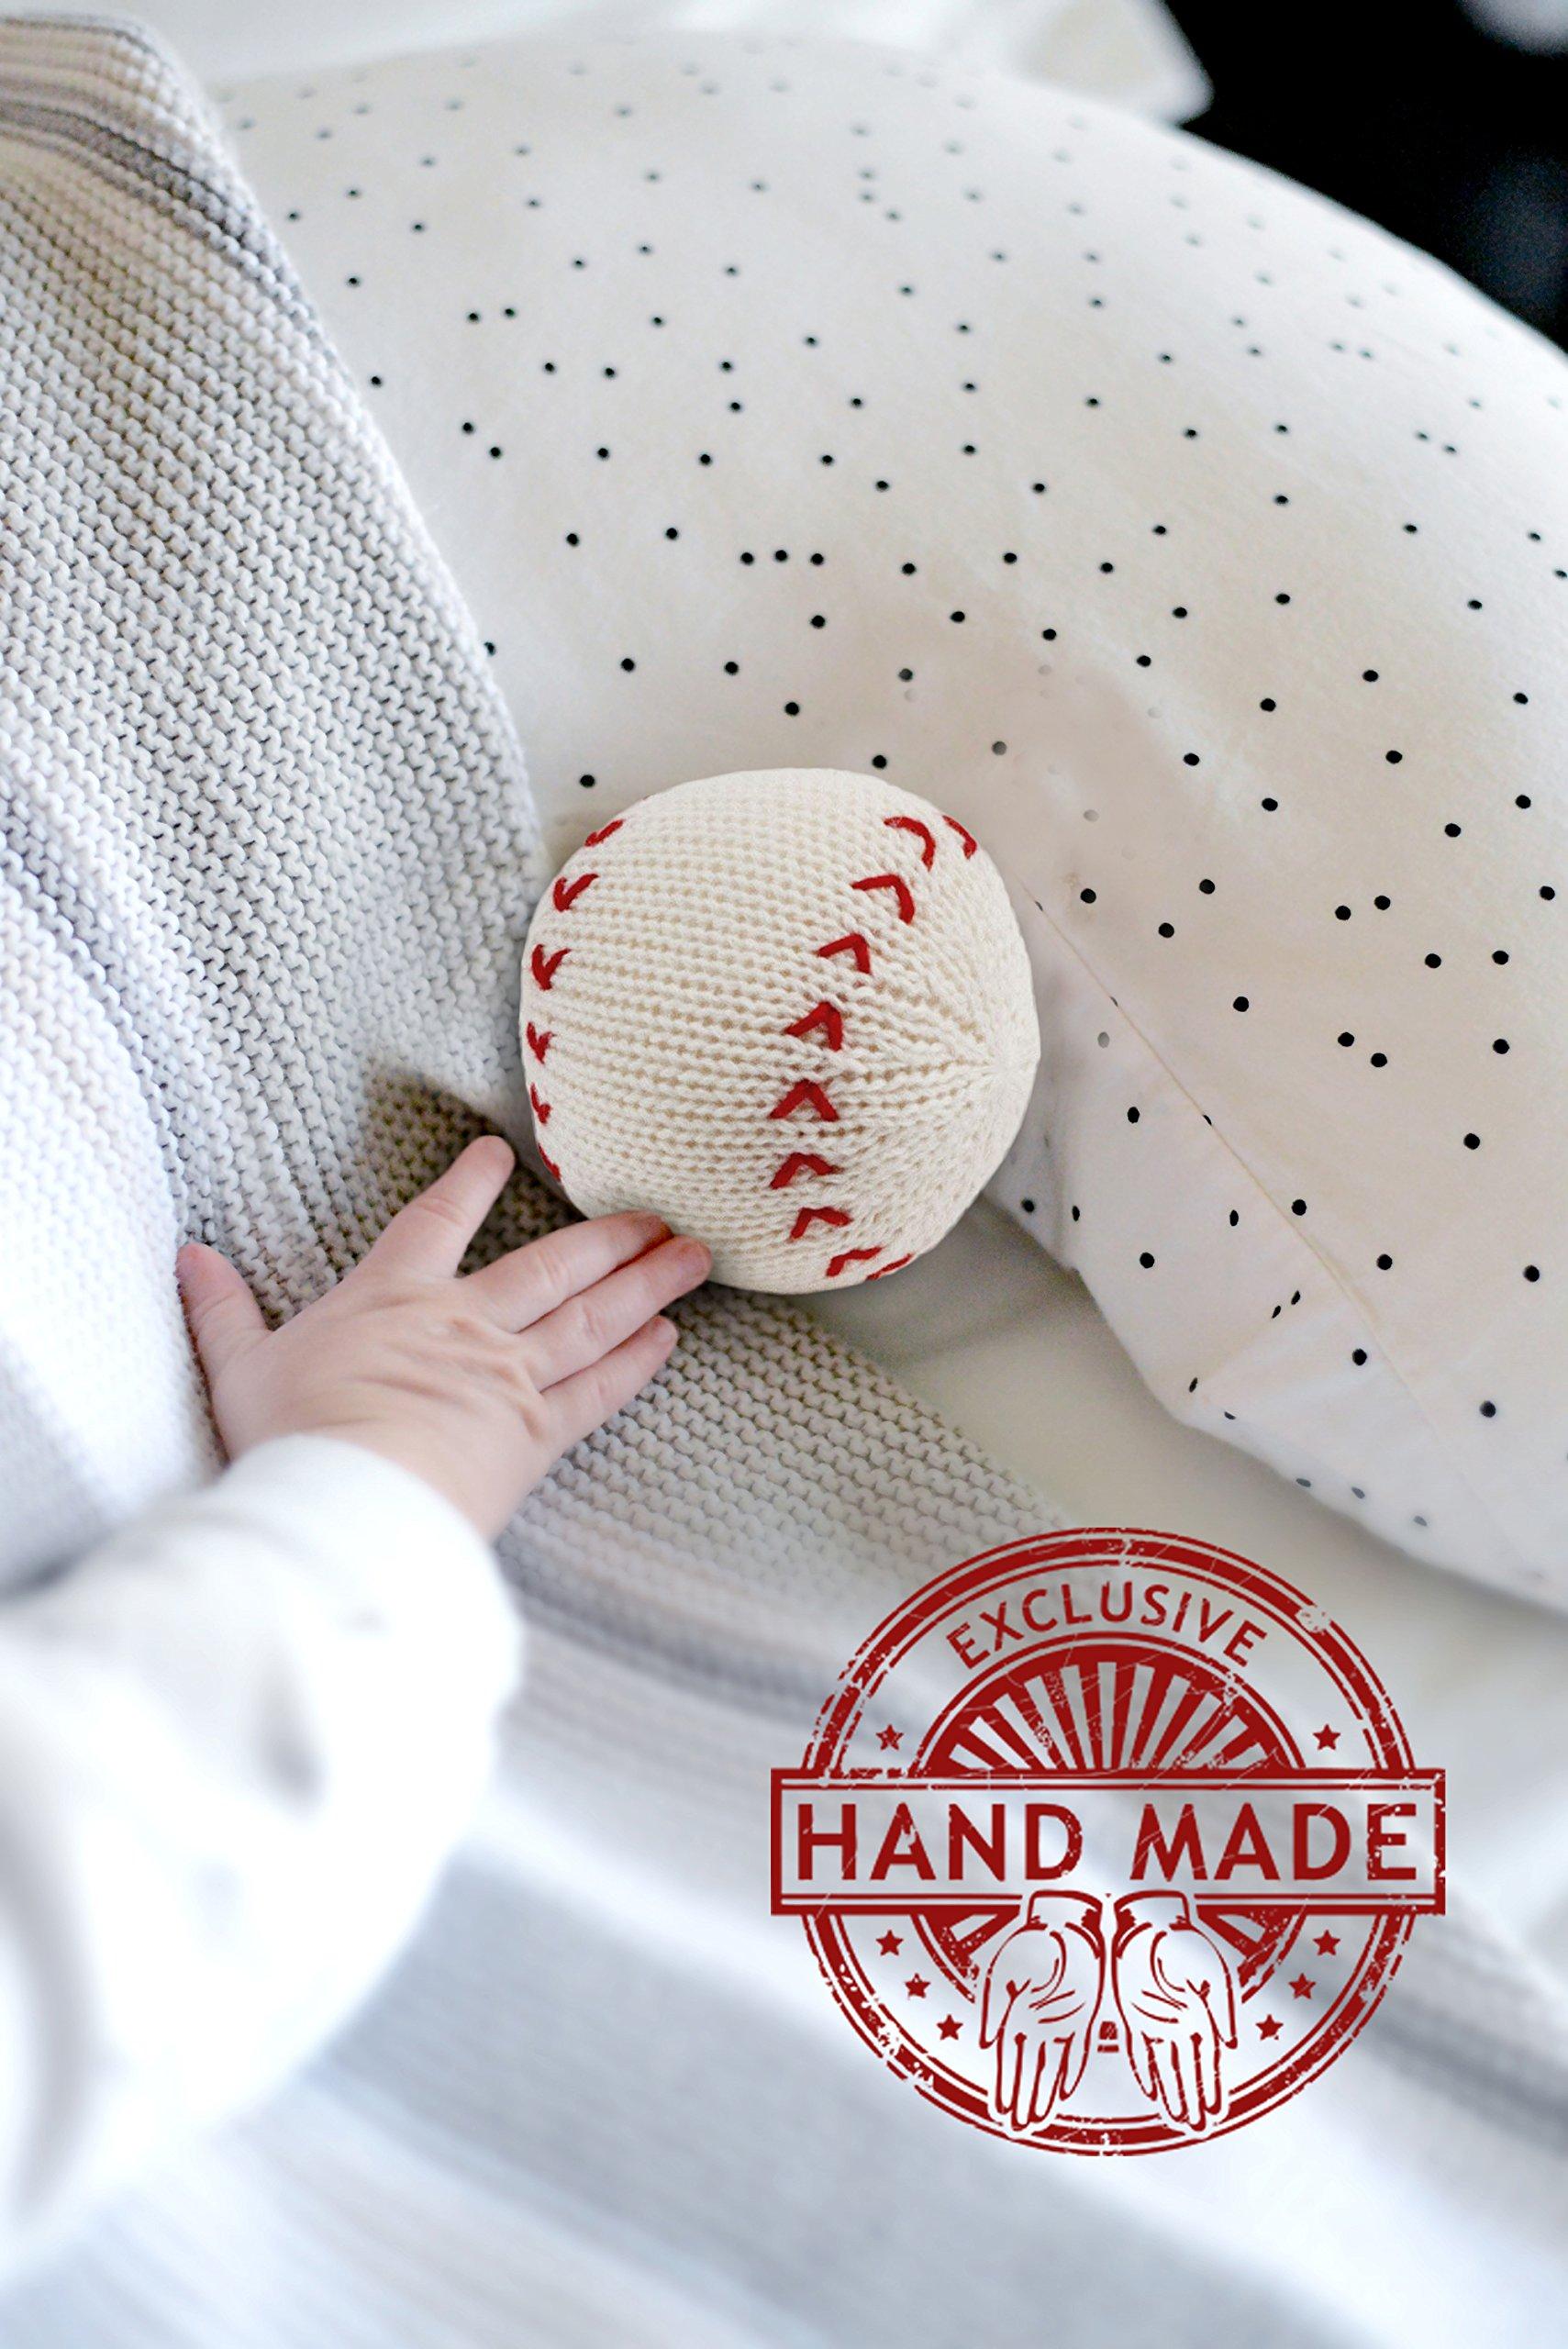 Estella Hand Knit Soft Organic Cotton Baby Rattle Toy, Baseball